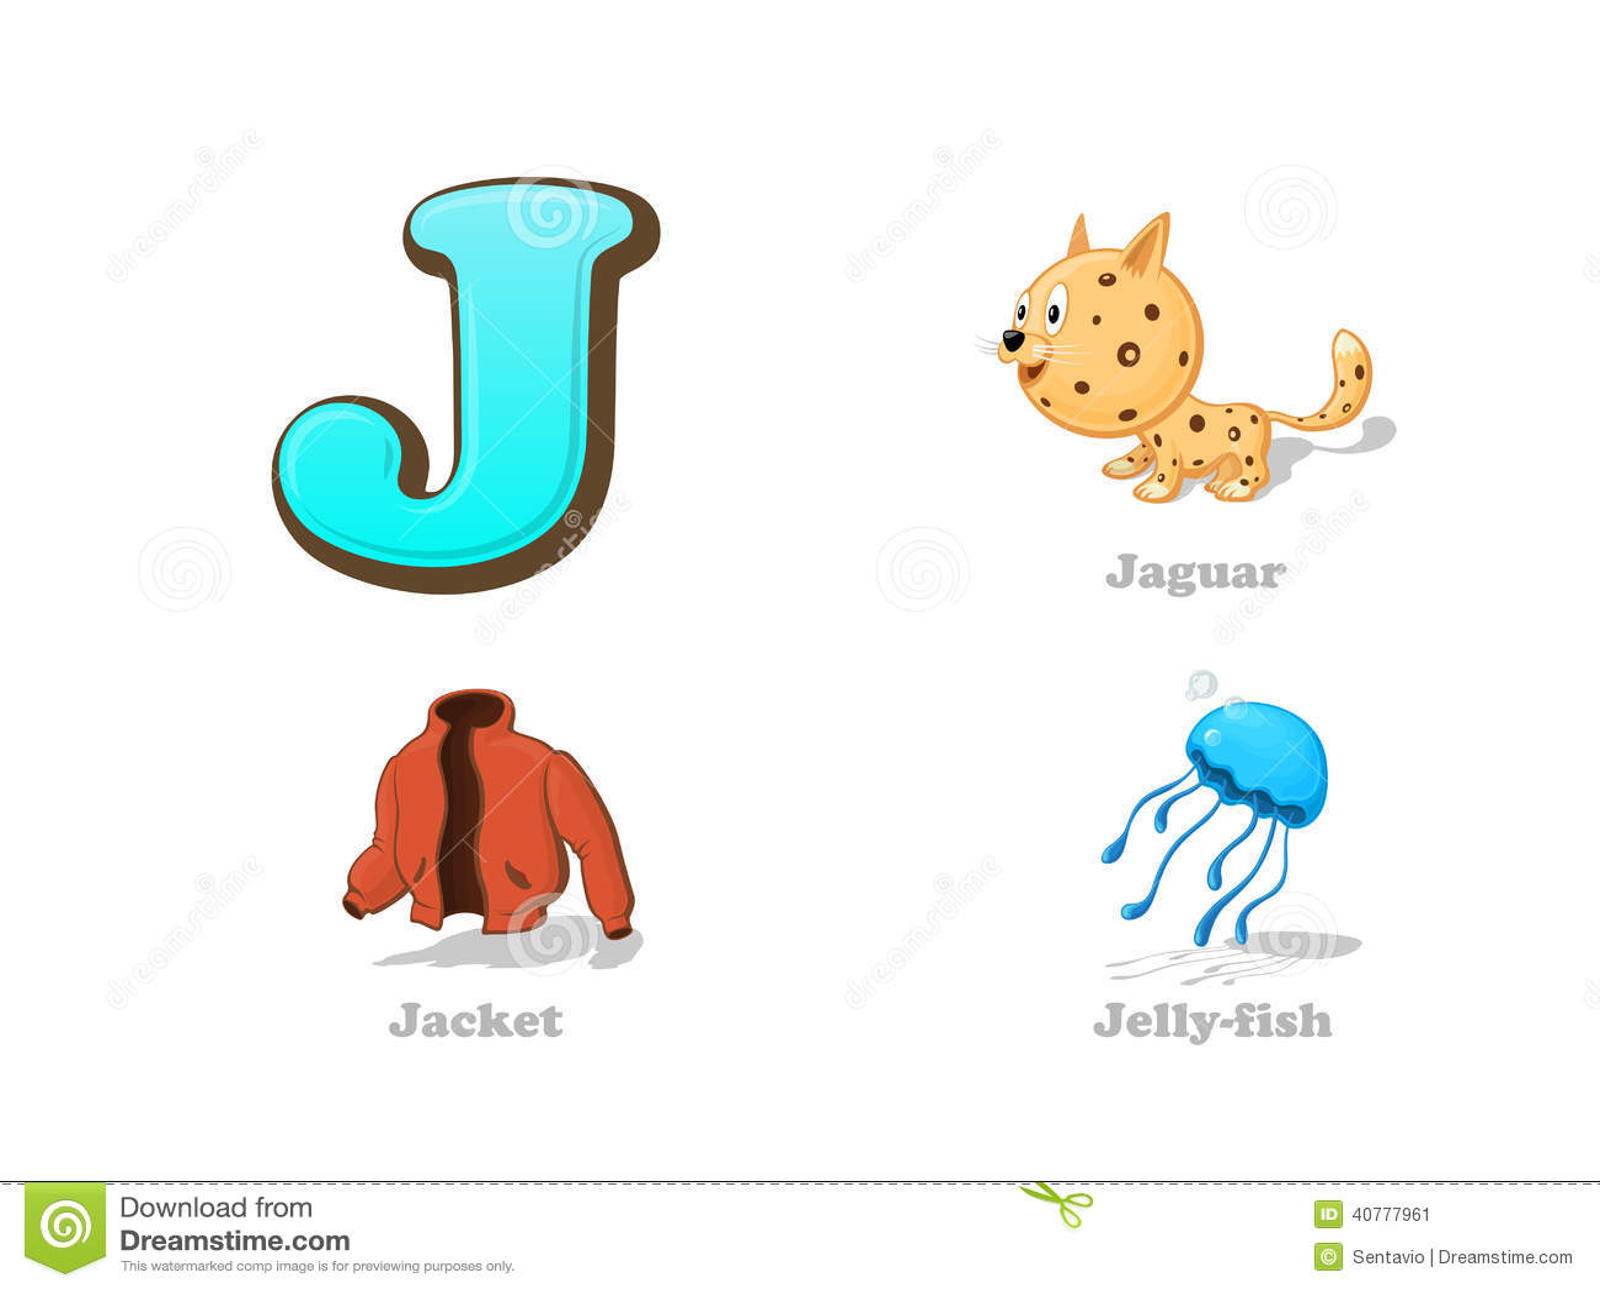 jellyfish worksheets